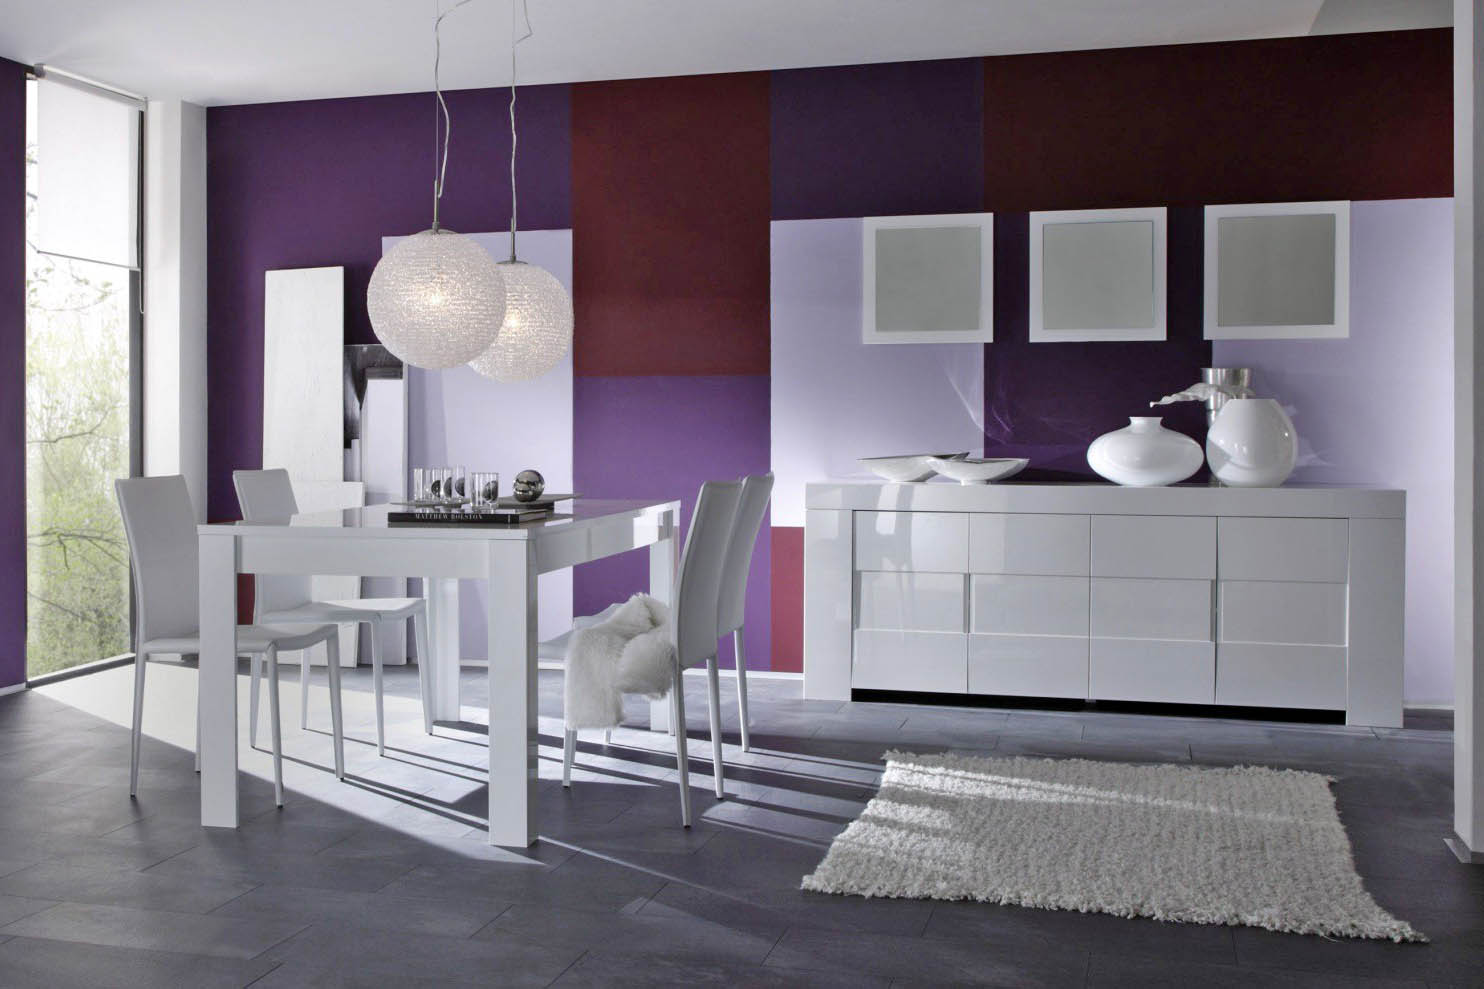 Salle a manger meuble et design blanc meuble et for Meuble salle a manger design